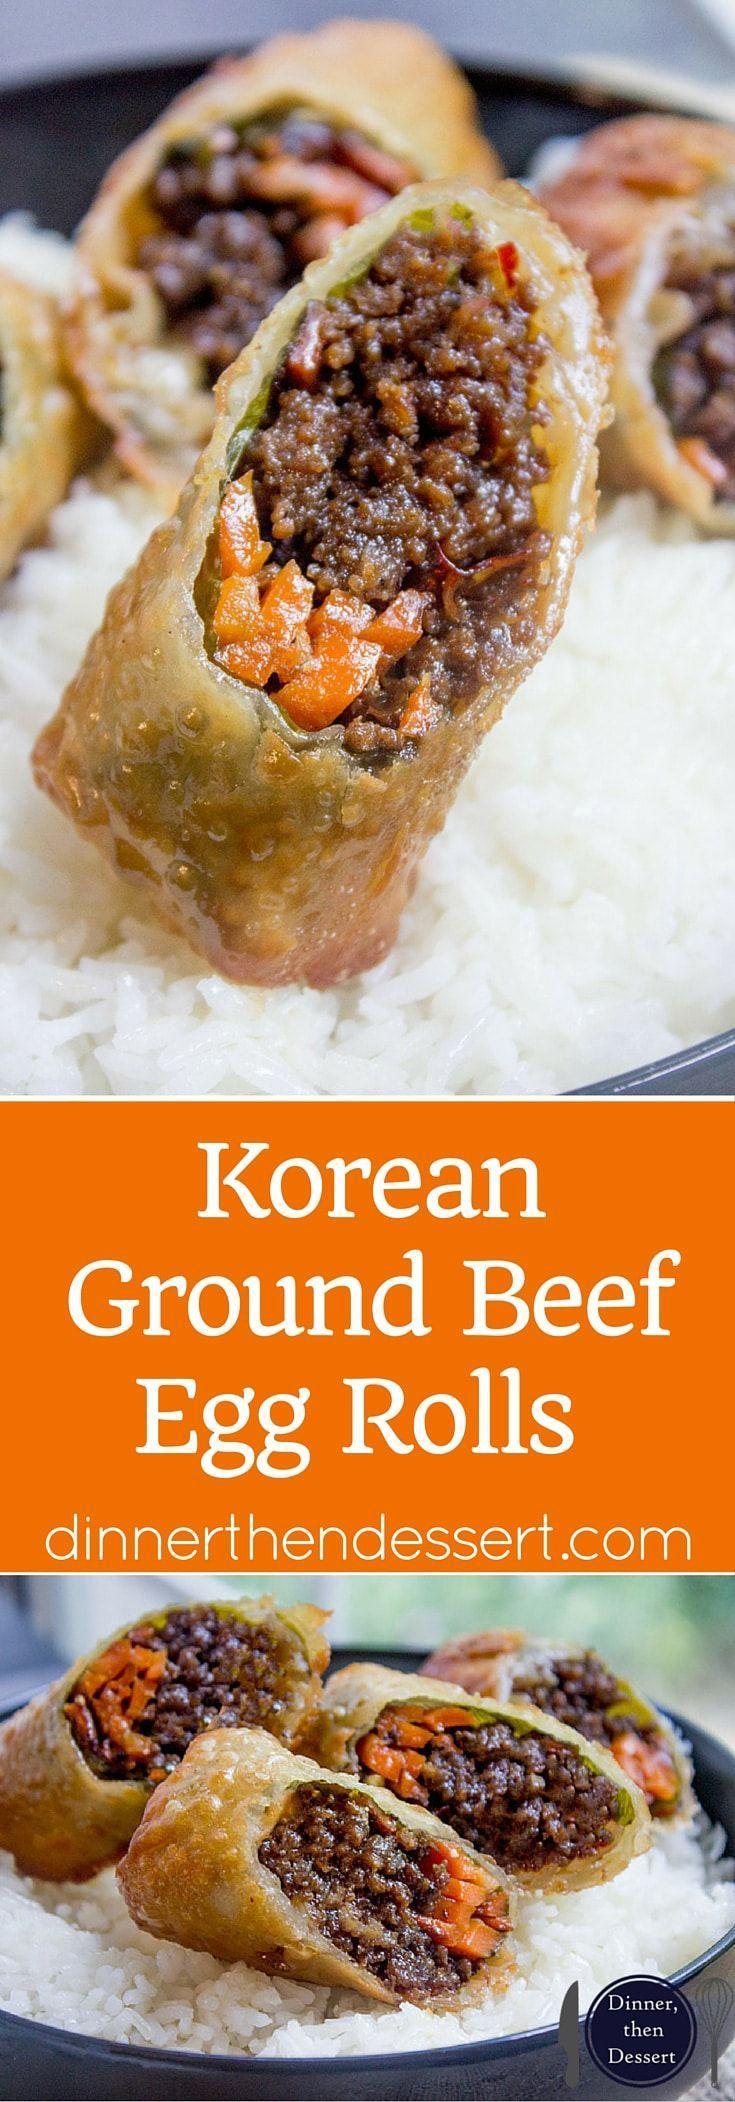 Korean ground beef, Egg rolls and Ground beef on Pinterest